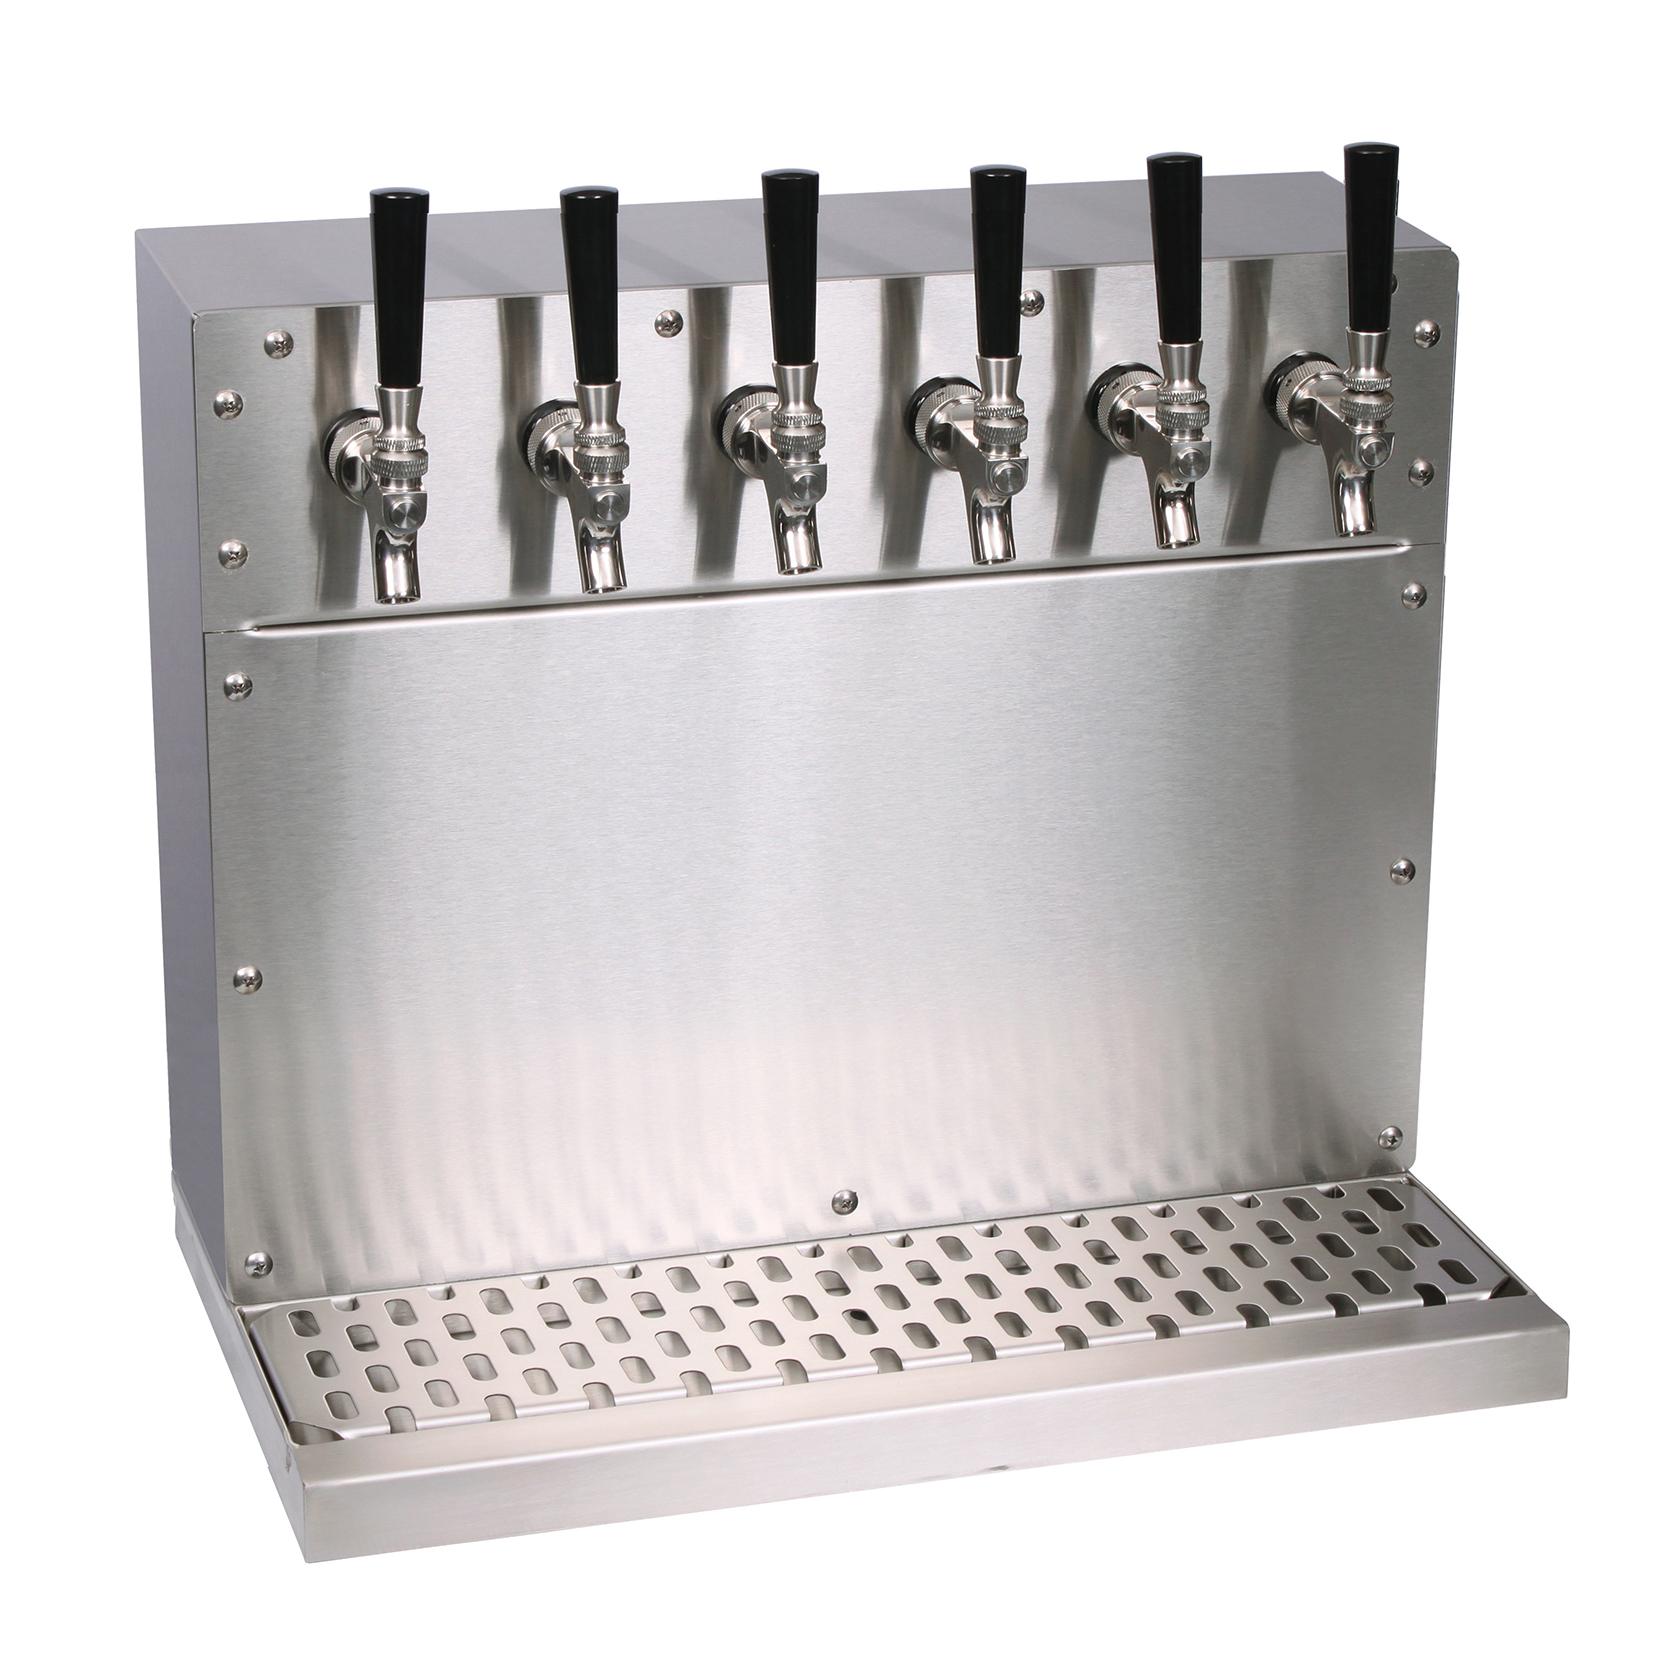 Glastender WT-6-SSR draft beer / wine dispensing tower